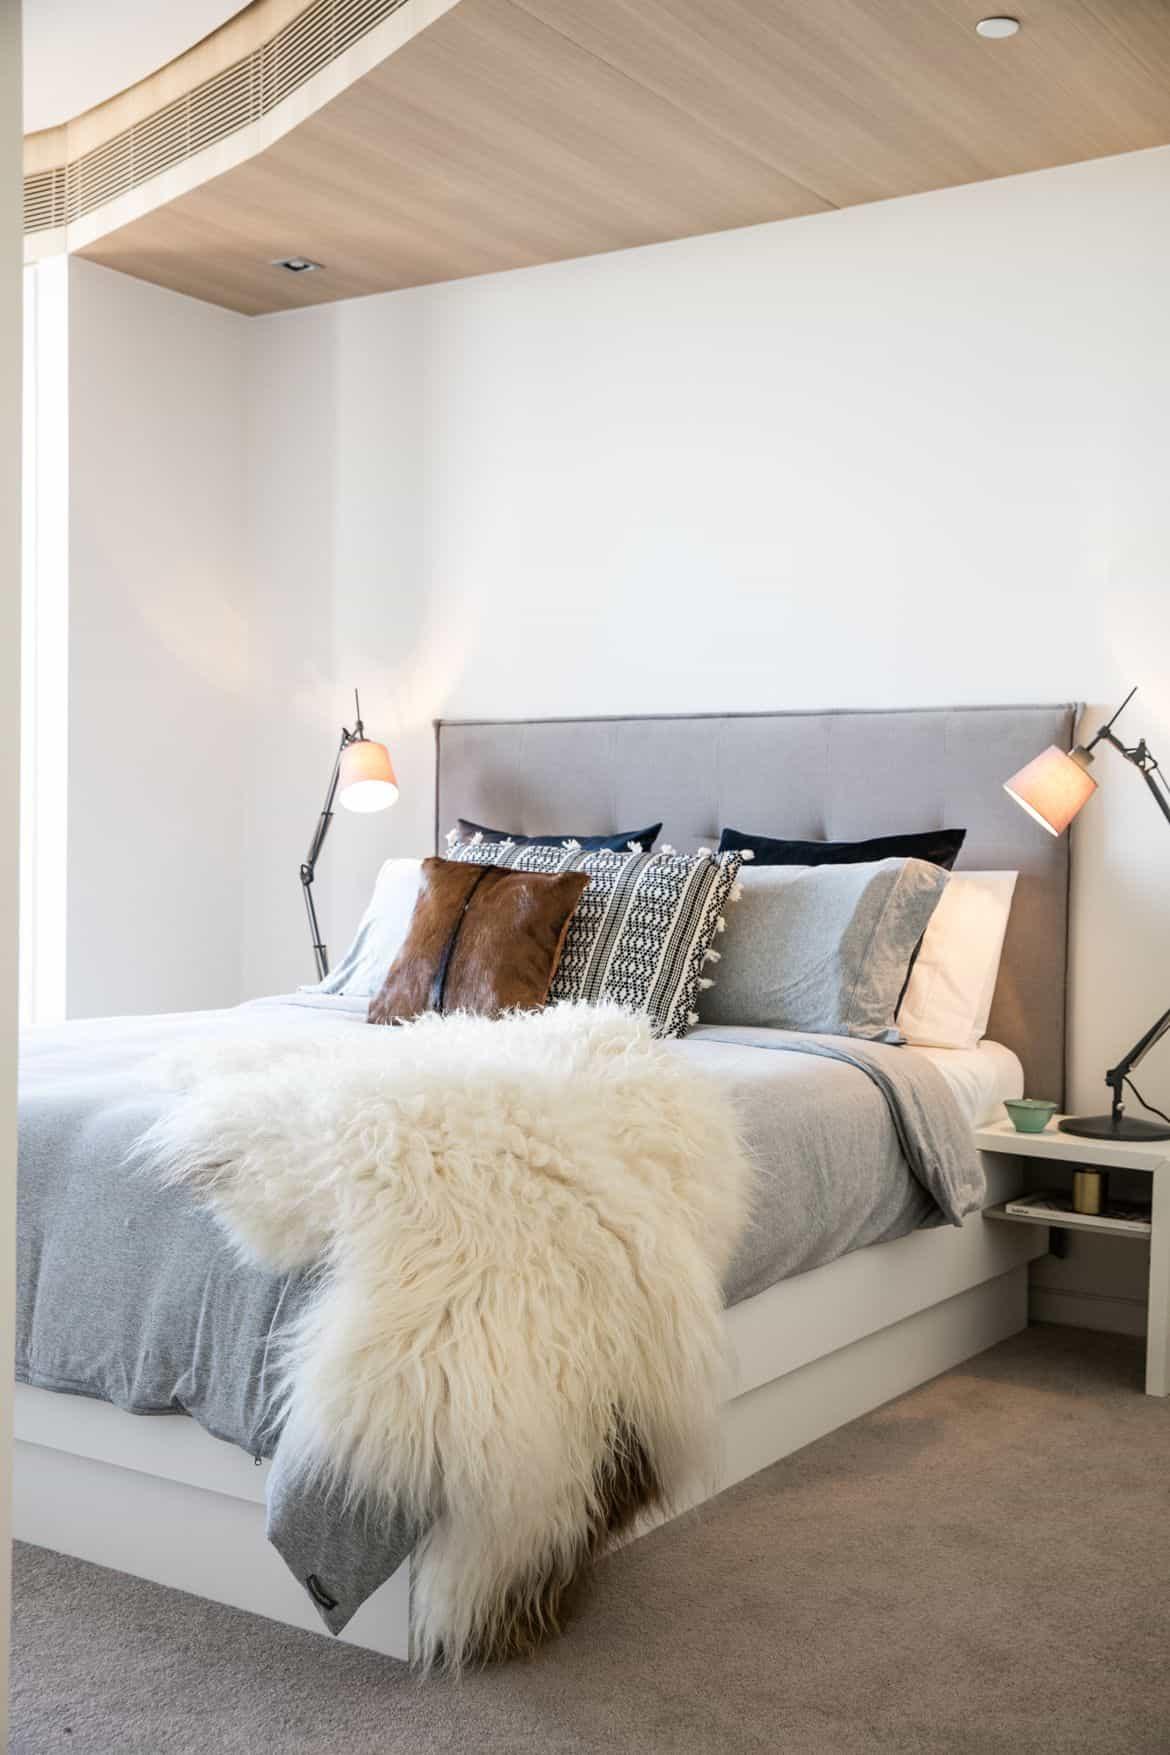 add storgae in guest bedroom